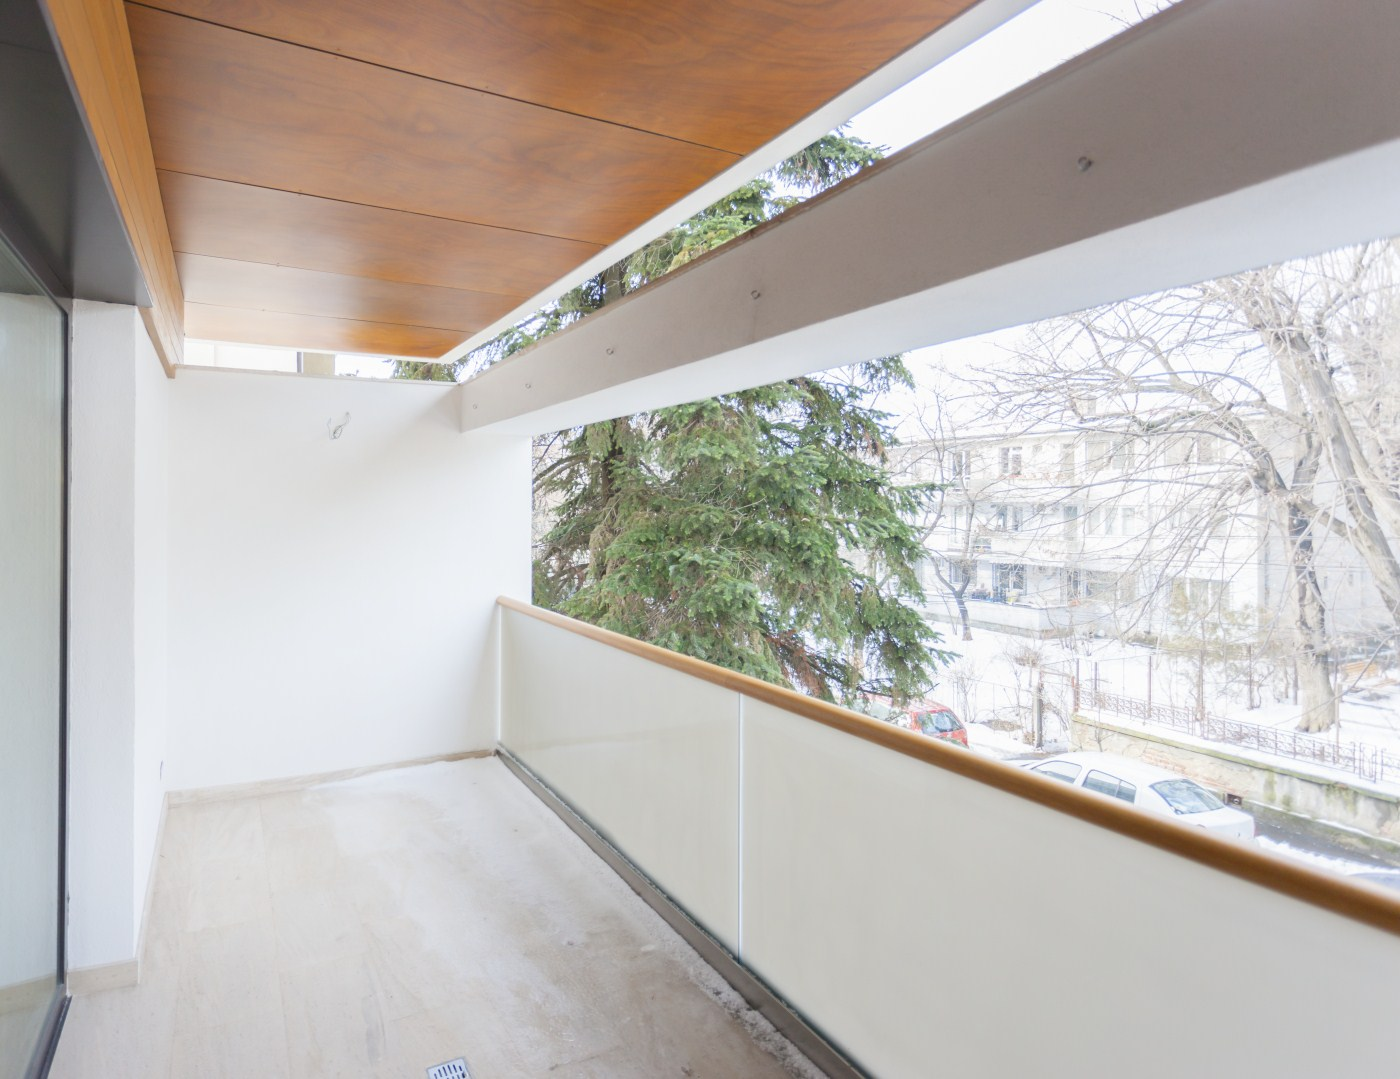 https://nbc-arhitect.ro/wp-content/uploads/2020/10/NBC-ARHITECT-_-housing-_-Sandu-Aldea-House-Villa-_-exterior-view-_-terrace.jpg